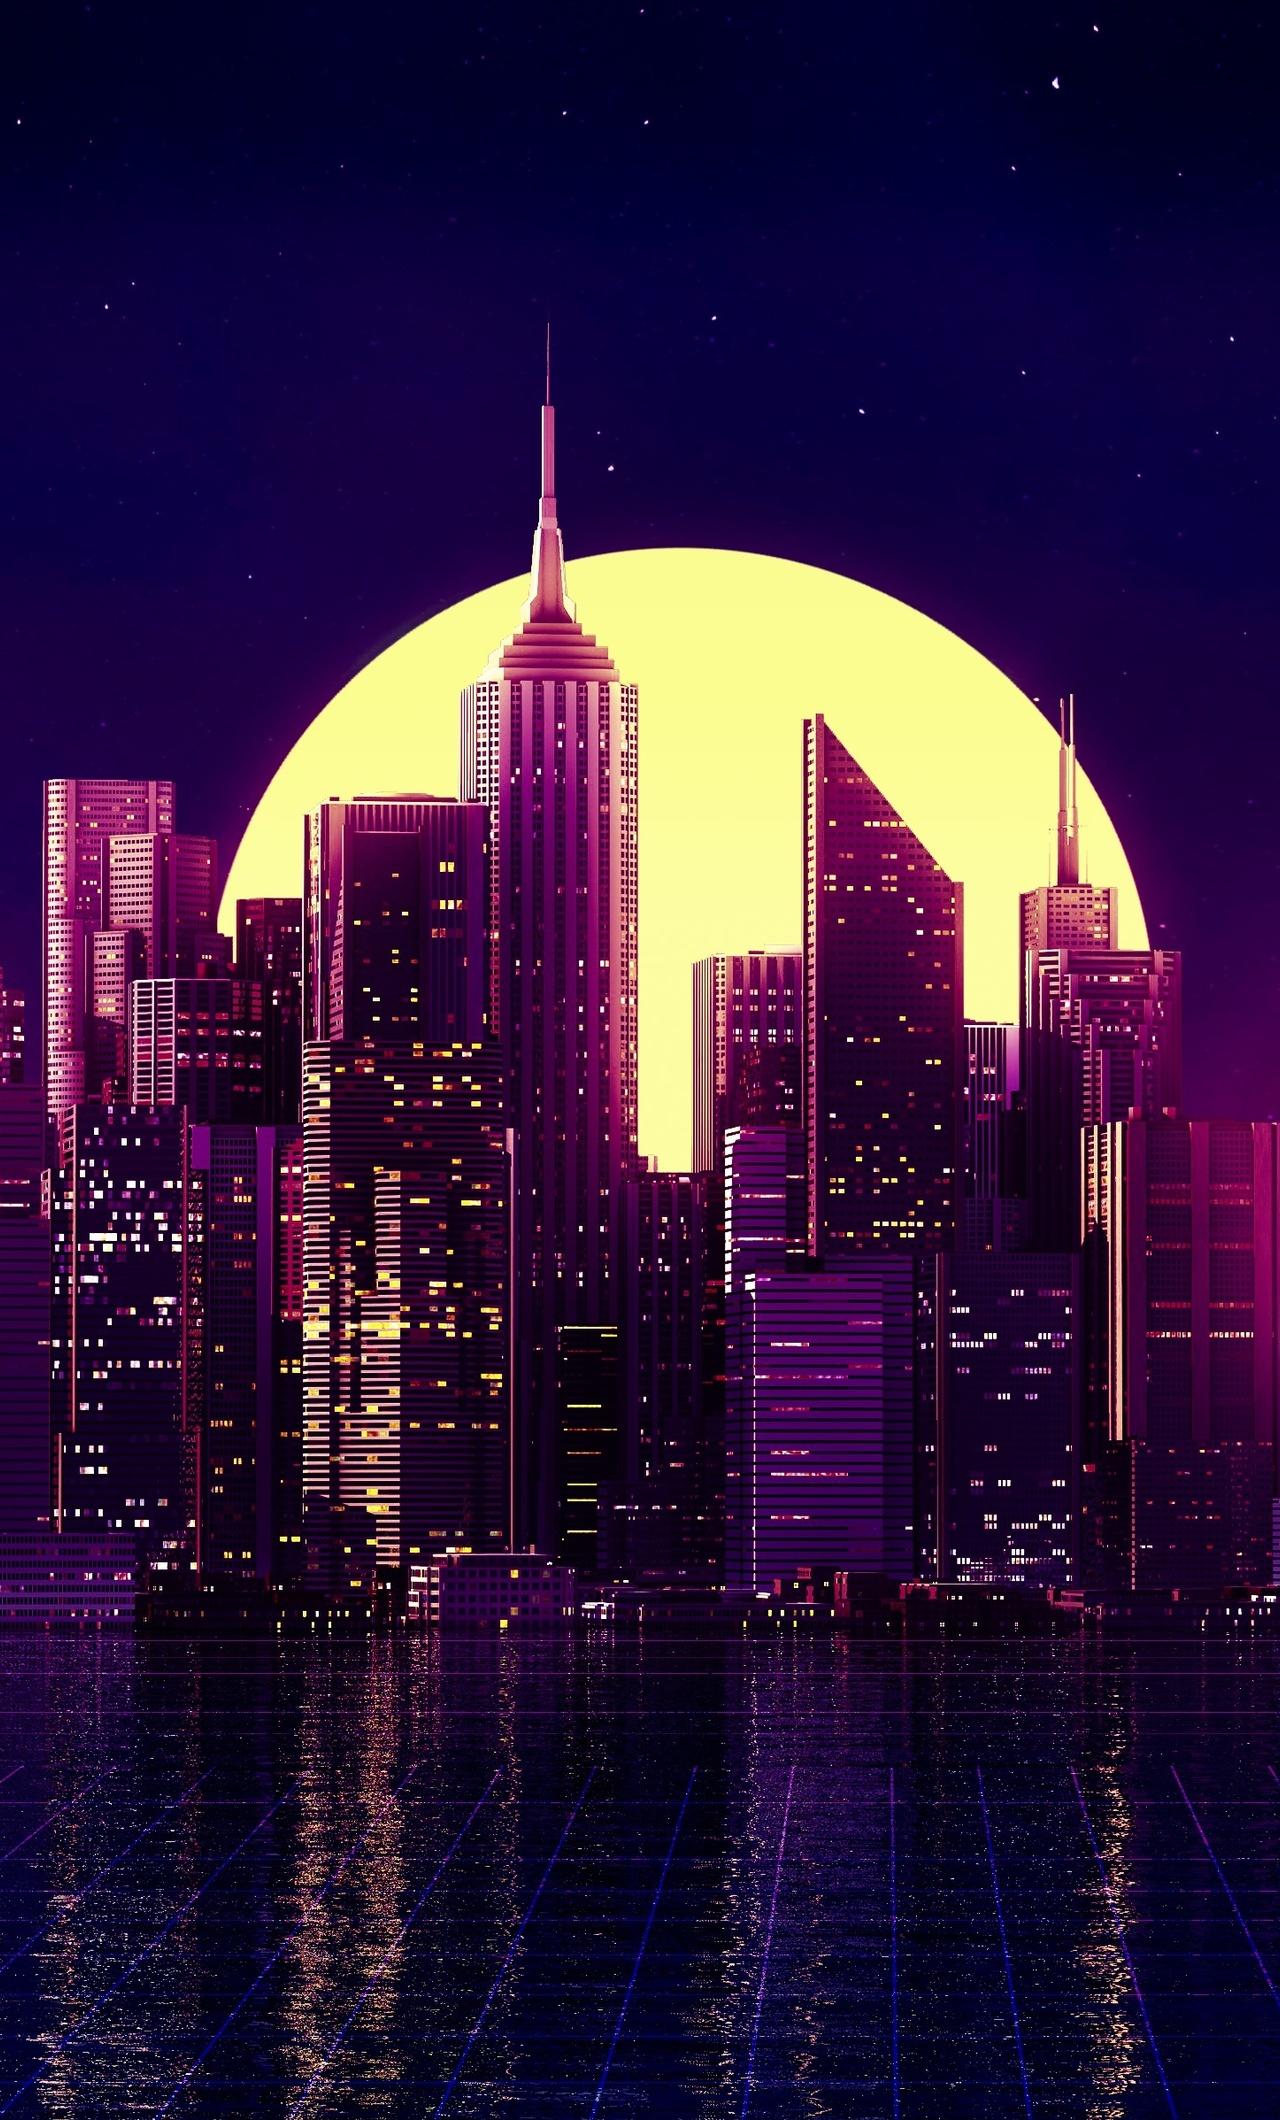 neon-city-buildings-reflection-skycrapper-minimalism-4k-mw.jpg